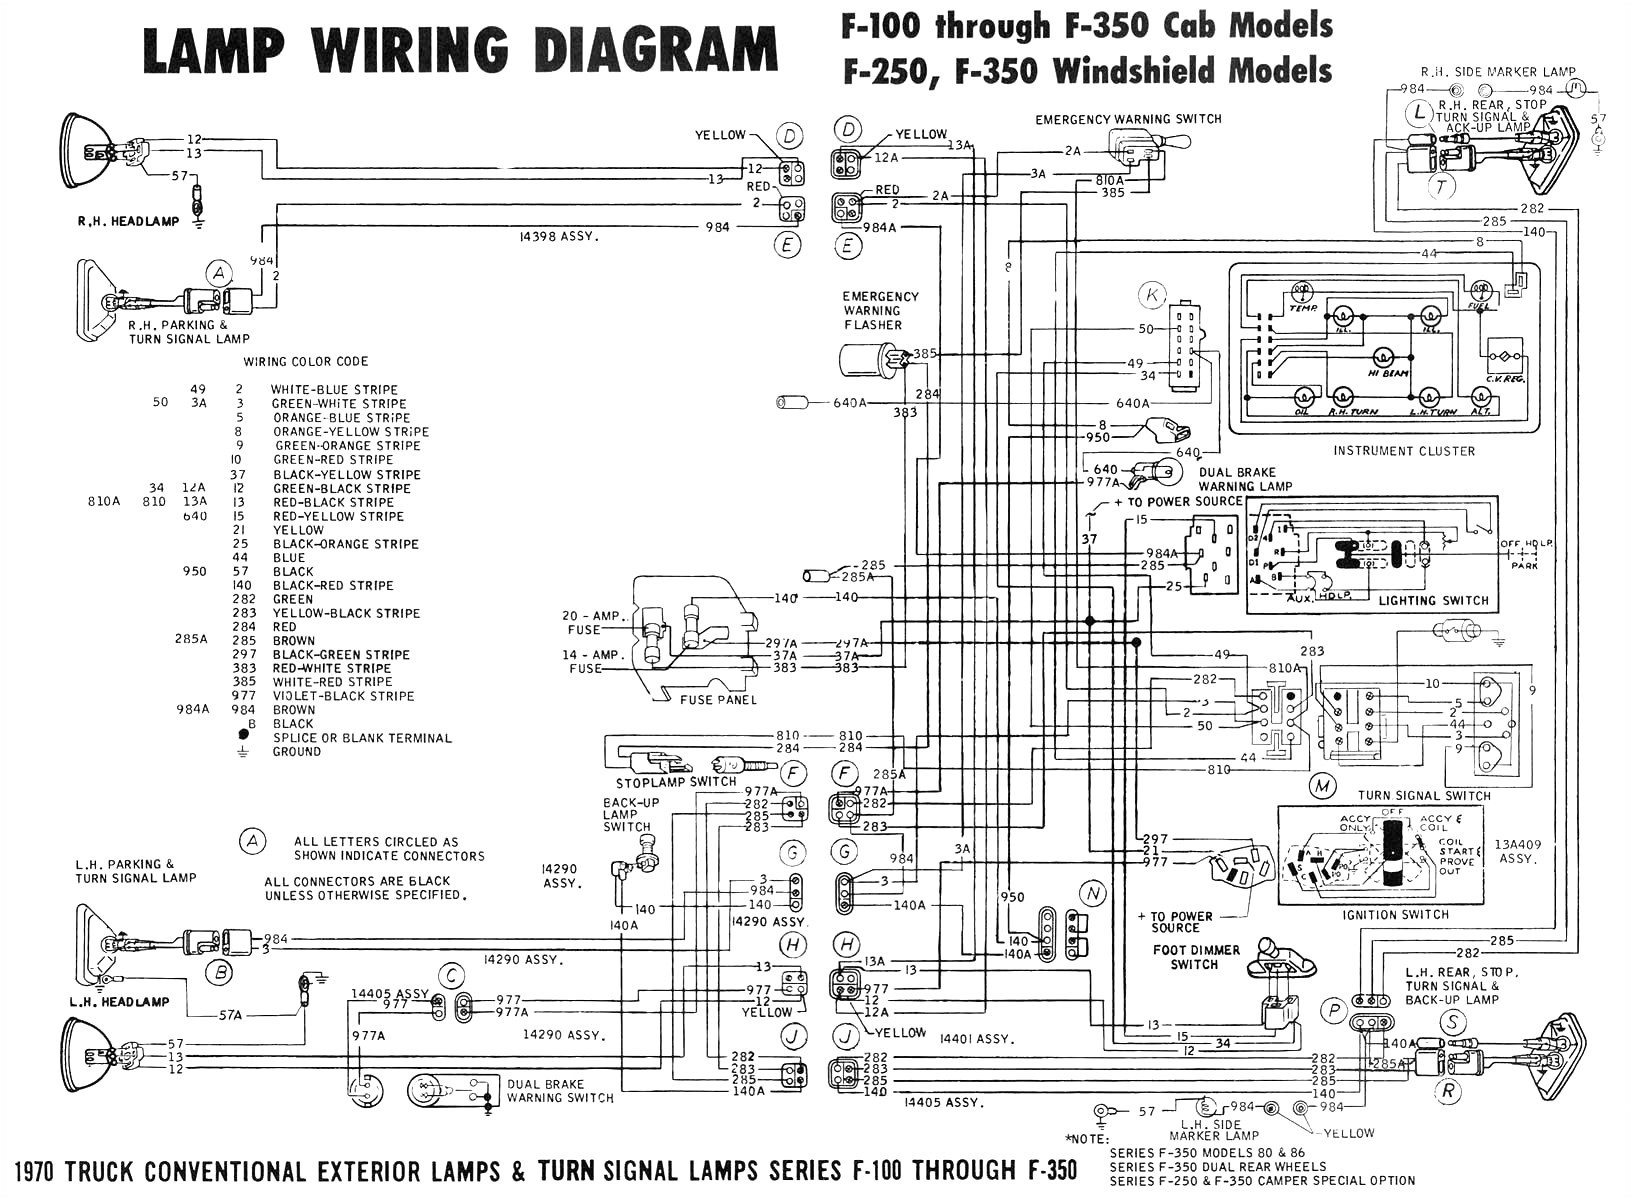 turn signal wiring diagram ford wiring diagram datasource 2006 ford fusion turn signal wiring diagram 1999